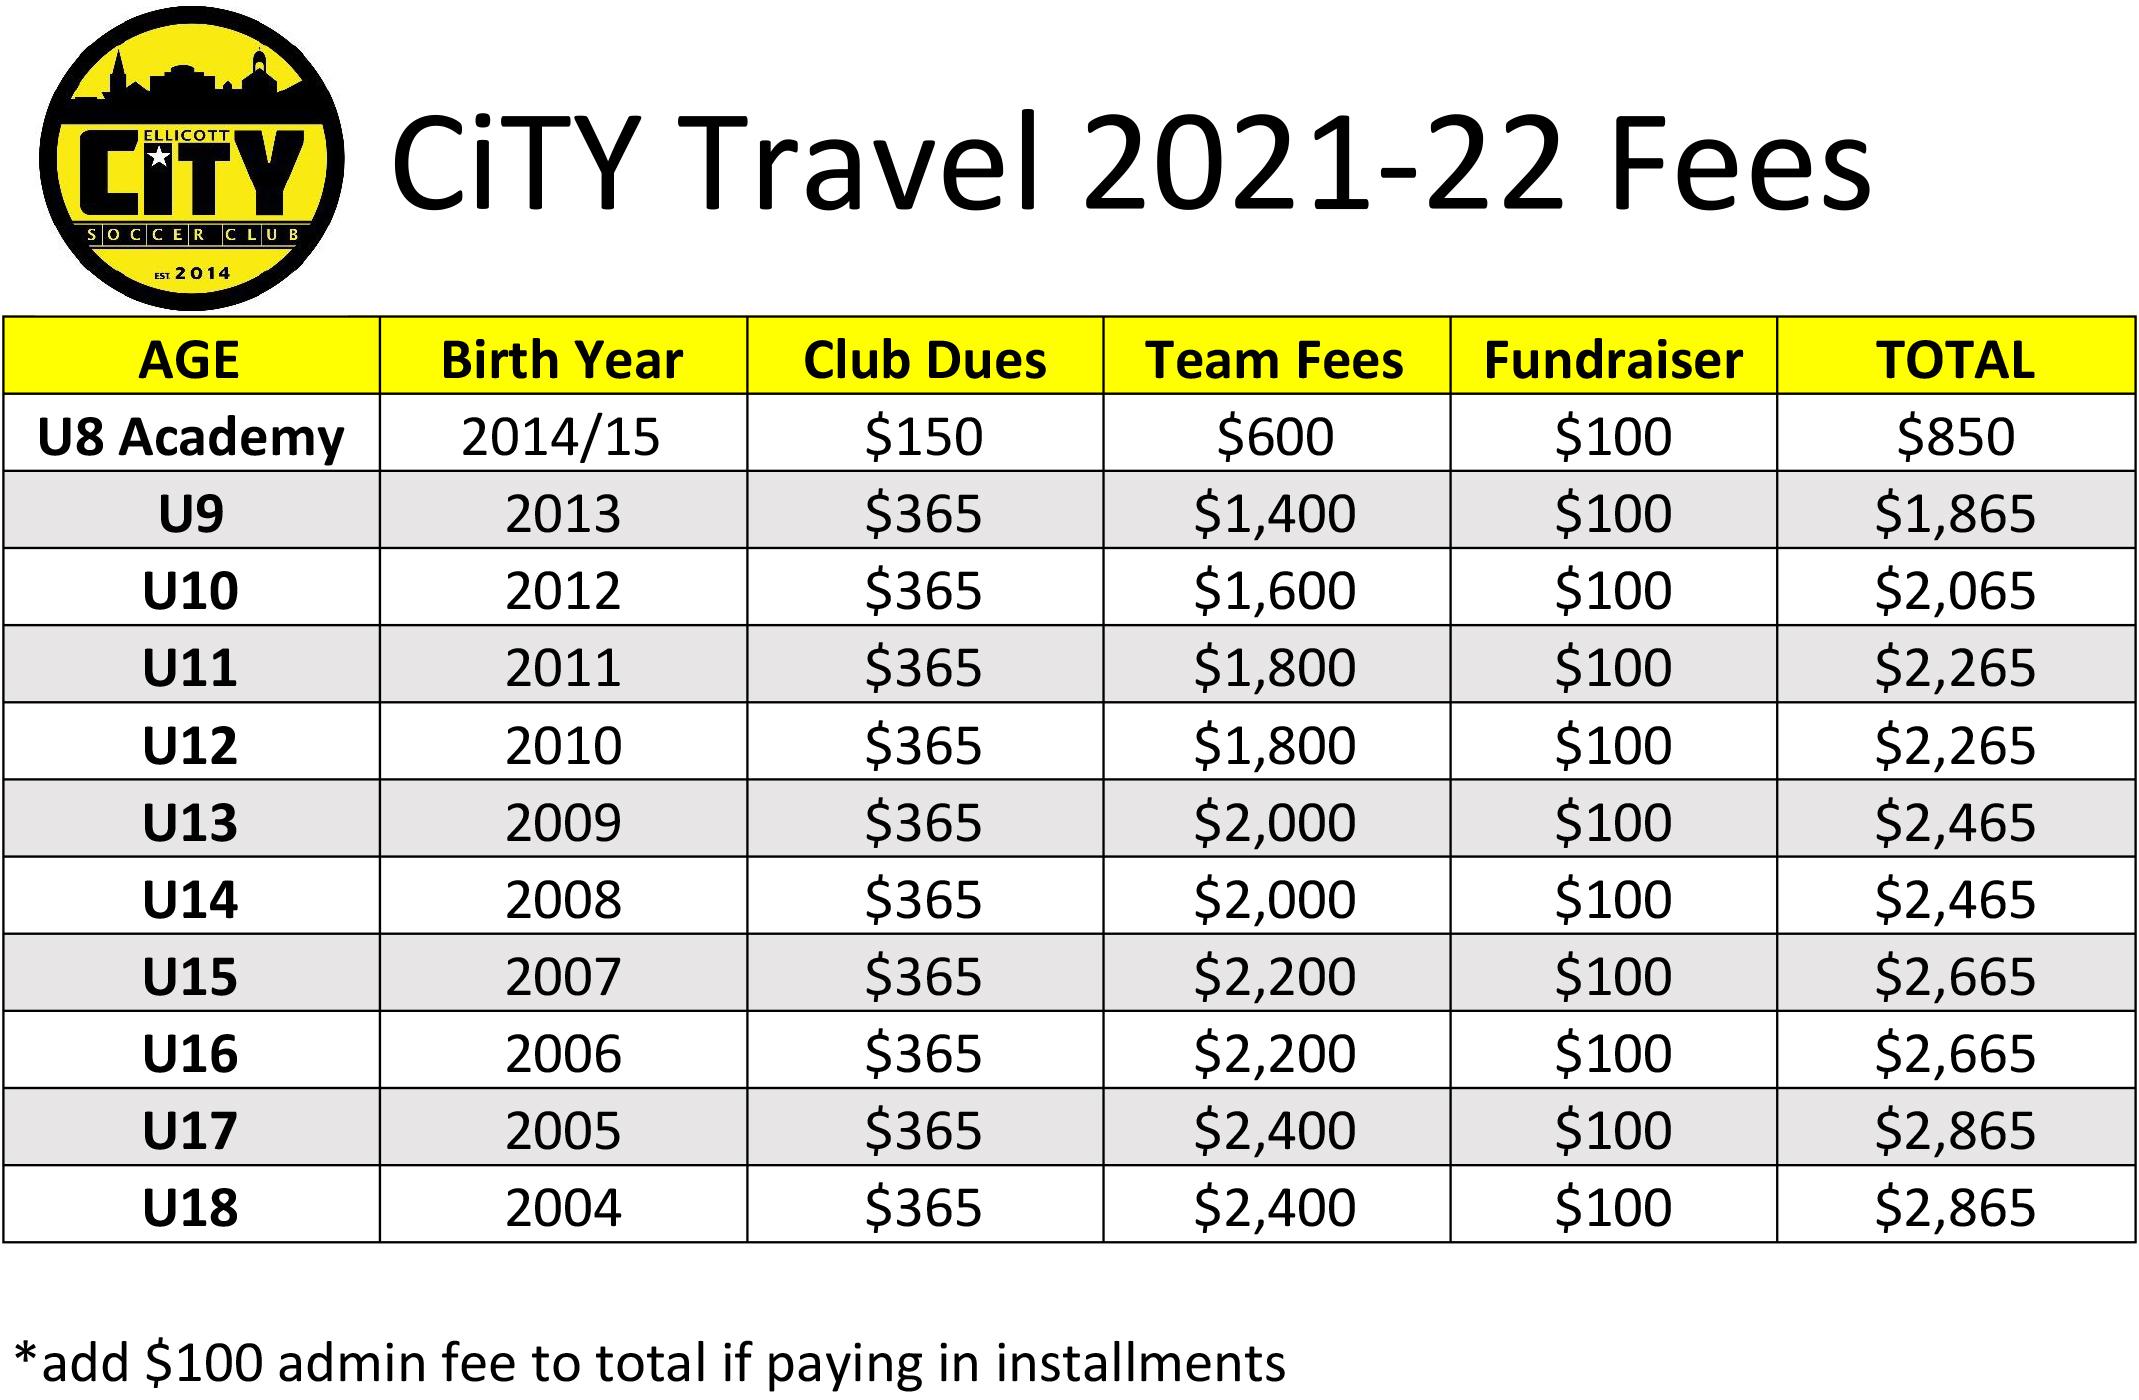 Travel 2021-22 Fees.xlsx